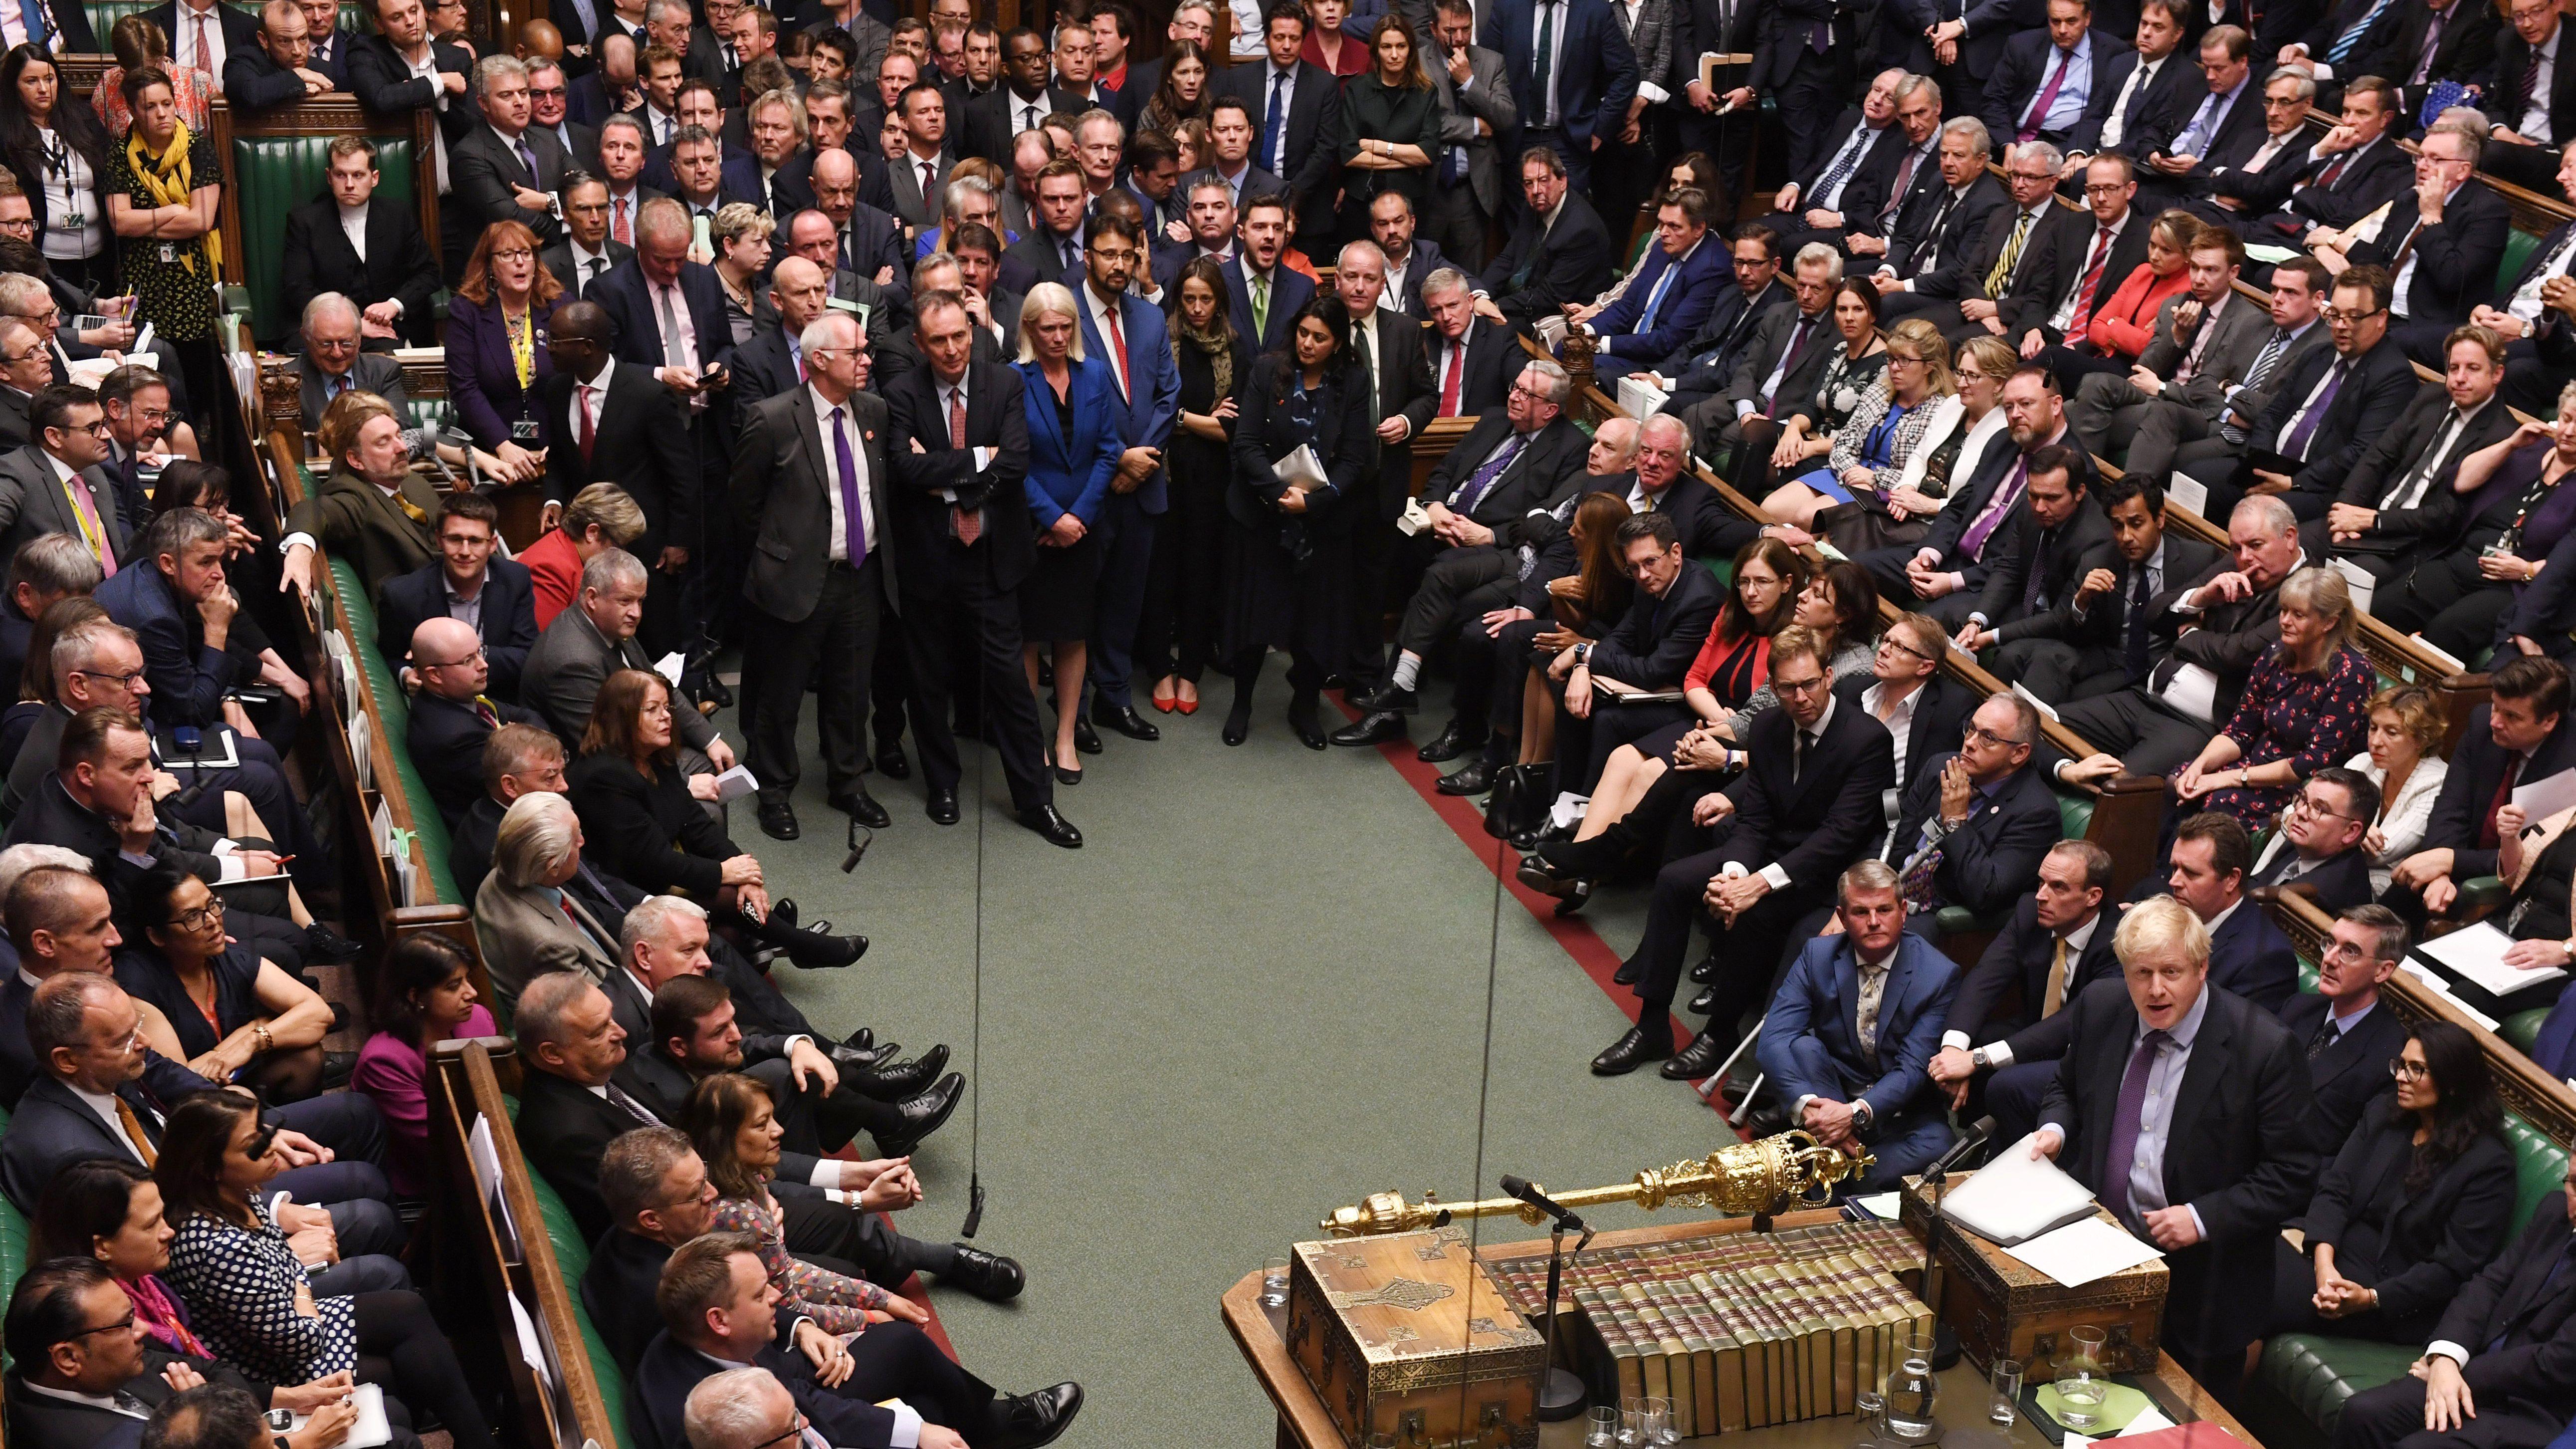 Britain's Prime Minister Boris Johnson speaks at the House of Commons in London